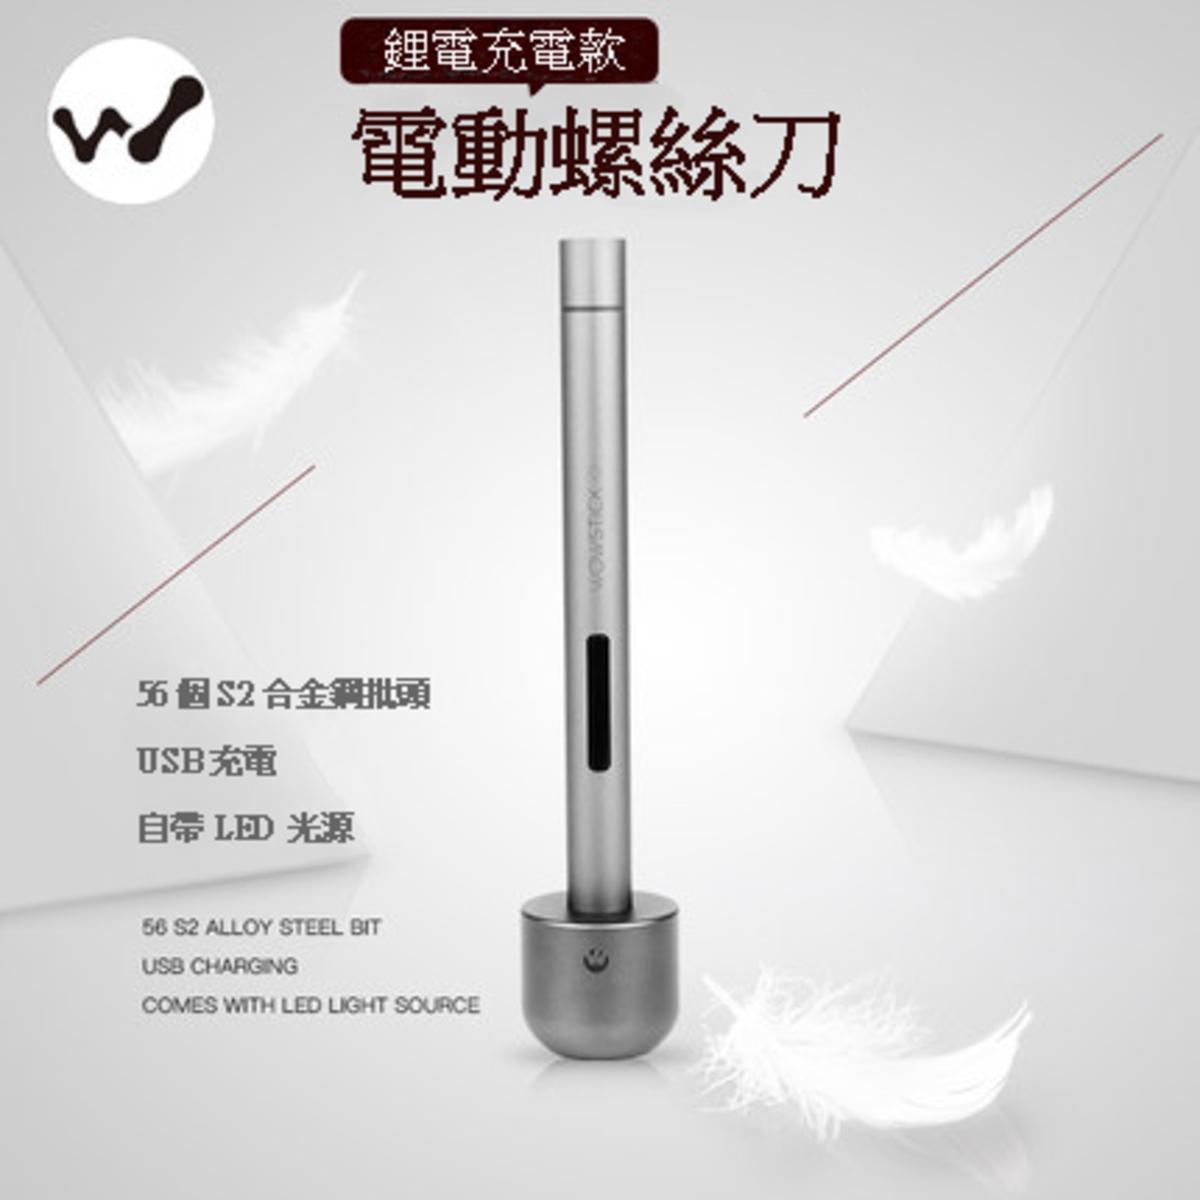 WOWSTICK 1F+ Mini Precision Electric Screwdriver Set (Lithium Battery)